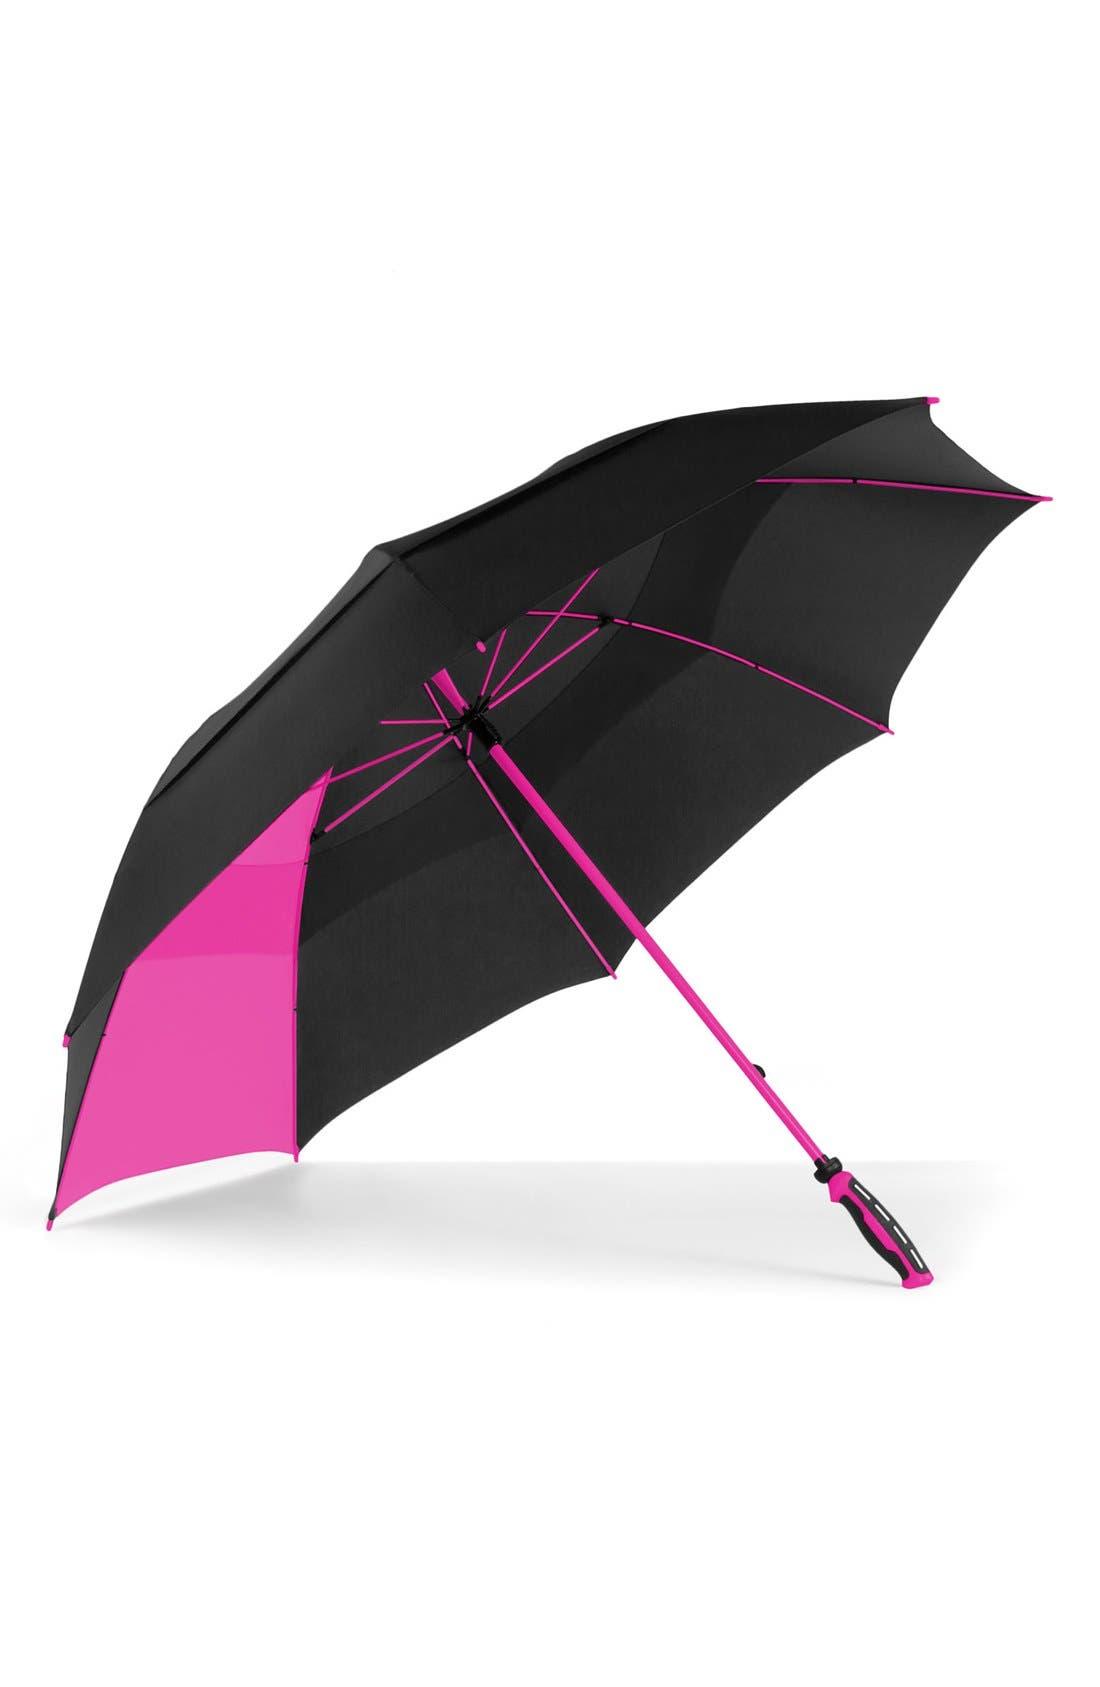 Main Image - ShedRain 'WindJammer®' Golf Umbrella